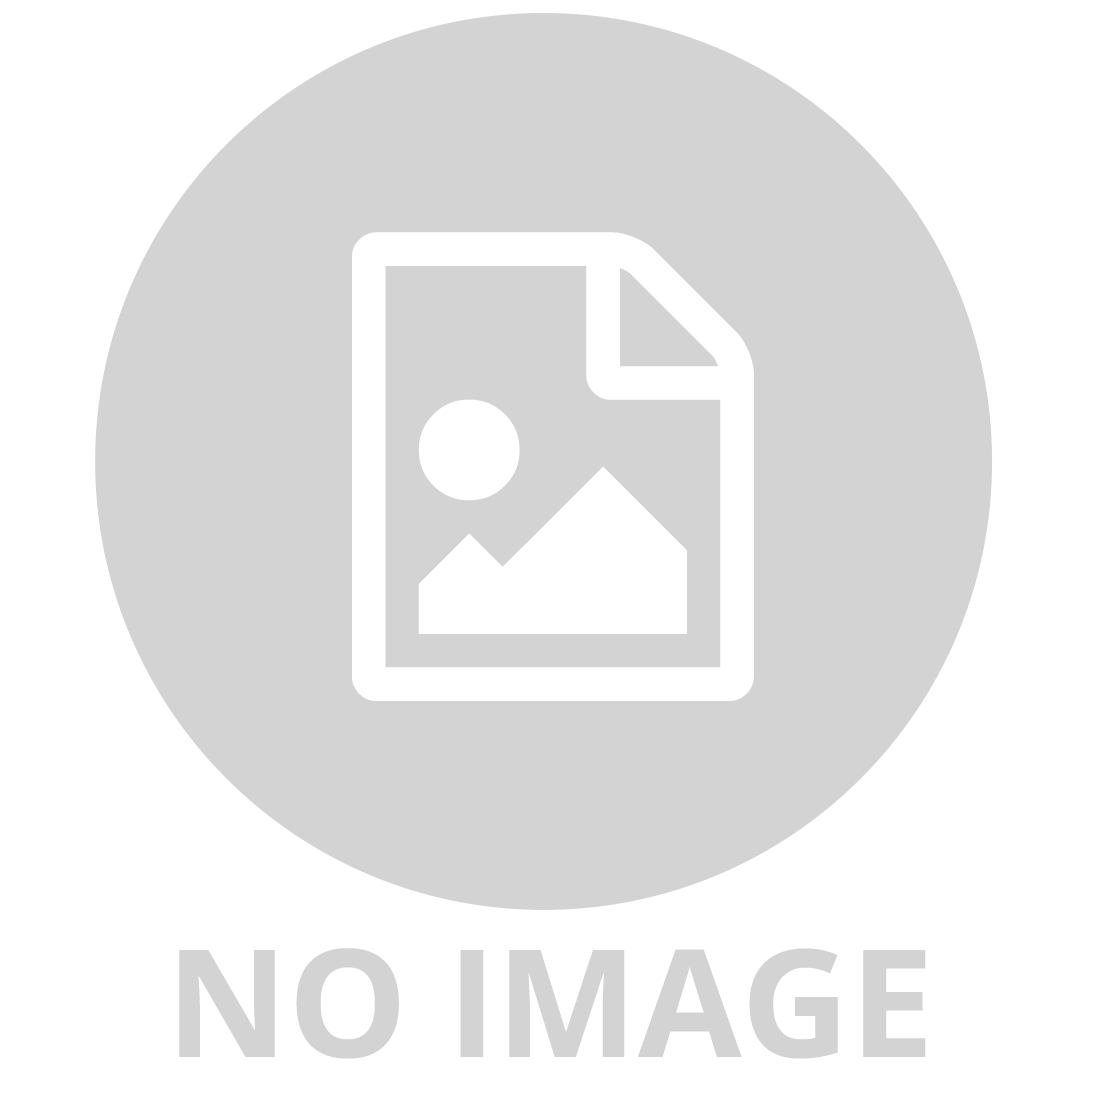 AIRFIX MEDIUM GIFT SET RMS TITANIC 1:700